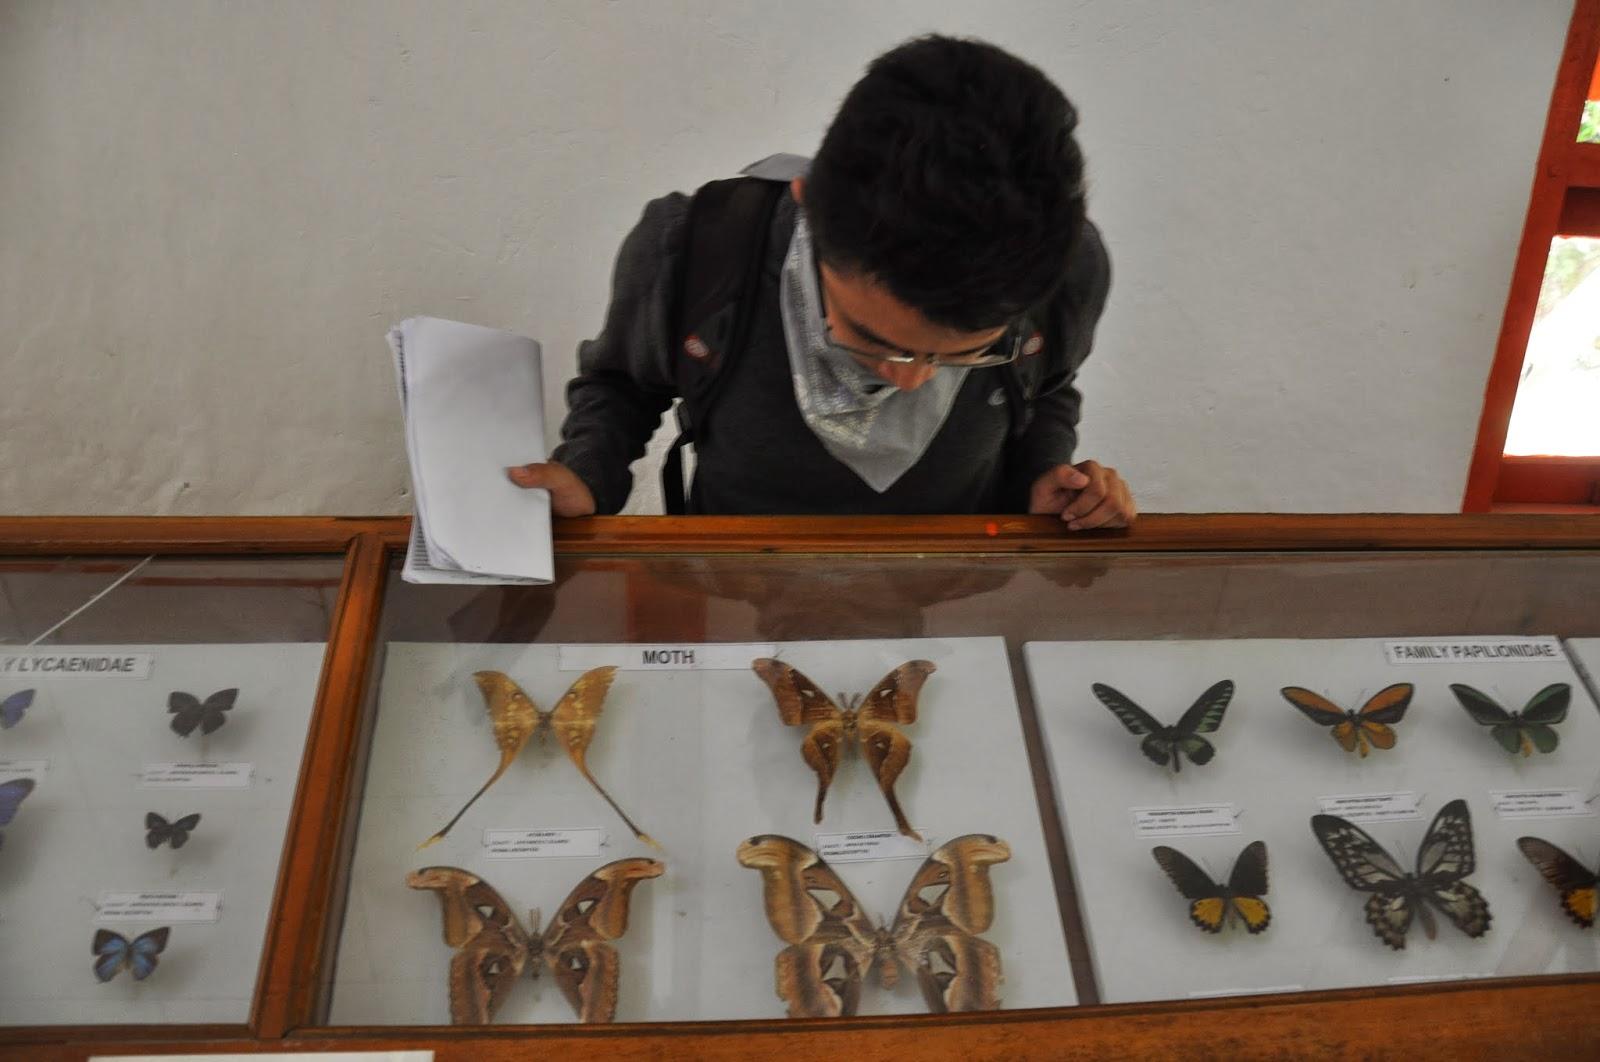 Wisata Edukasi Mengunjungi Museum Biologi Indonesia Kupu Bantimurung Musium Zoologi